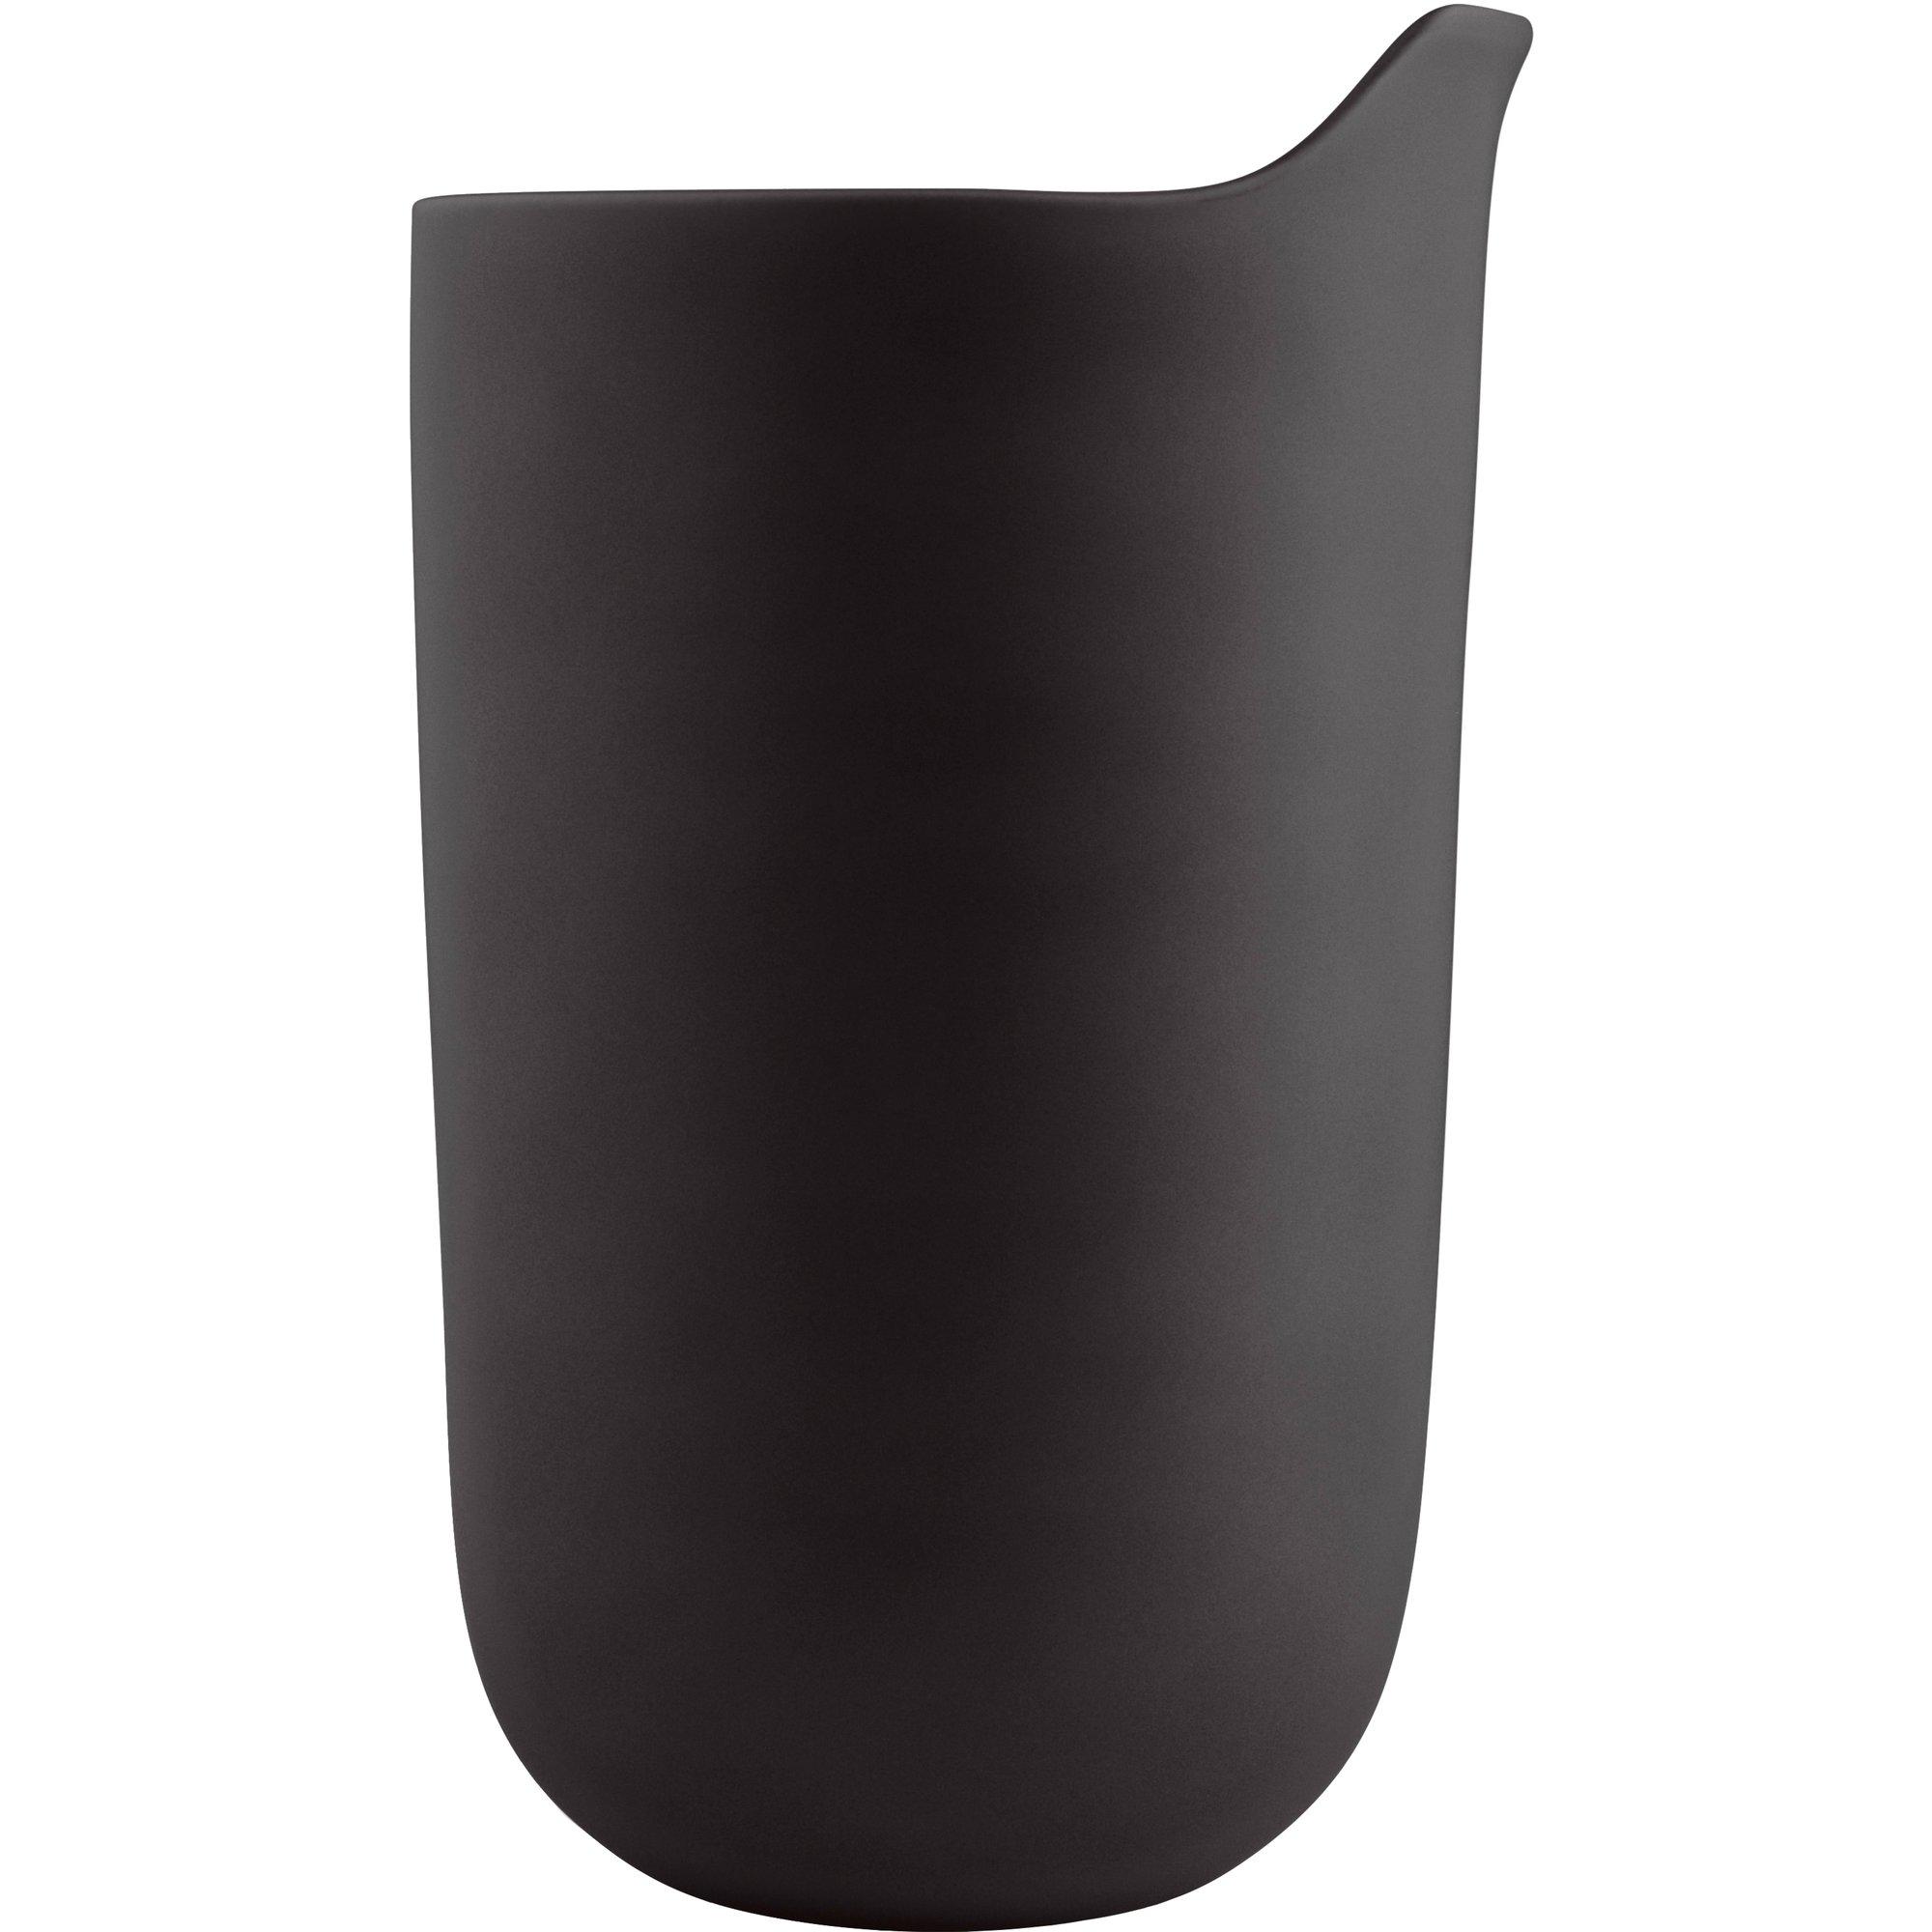 Eva Solo Termomugg i keramik 028 liter Svart